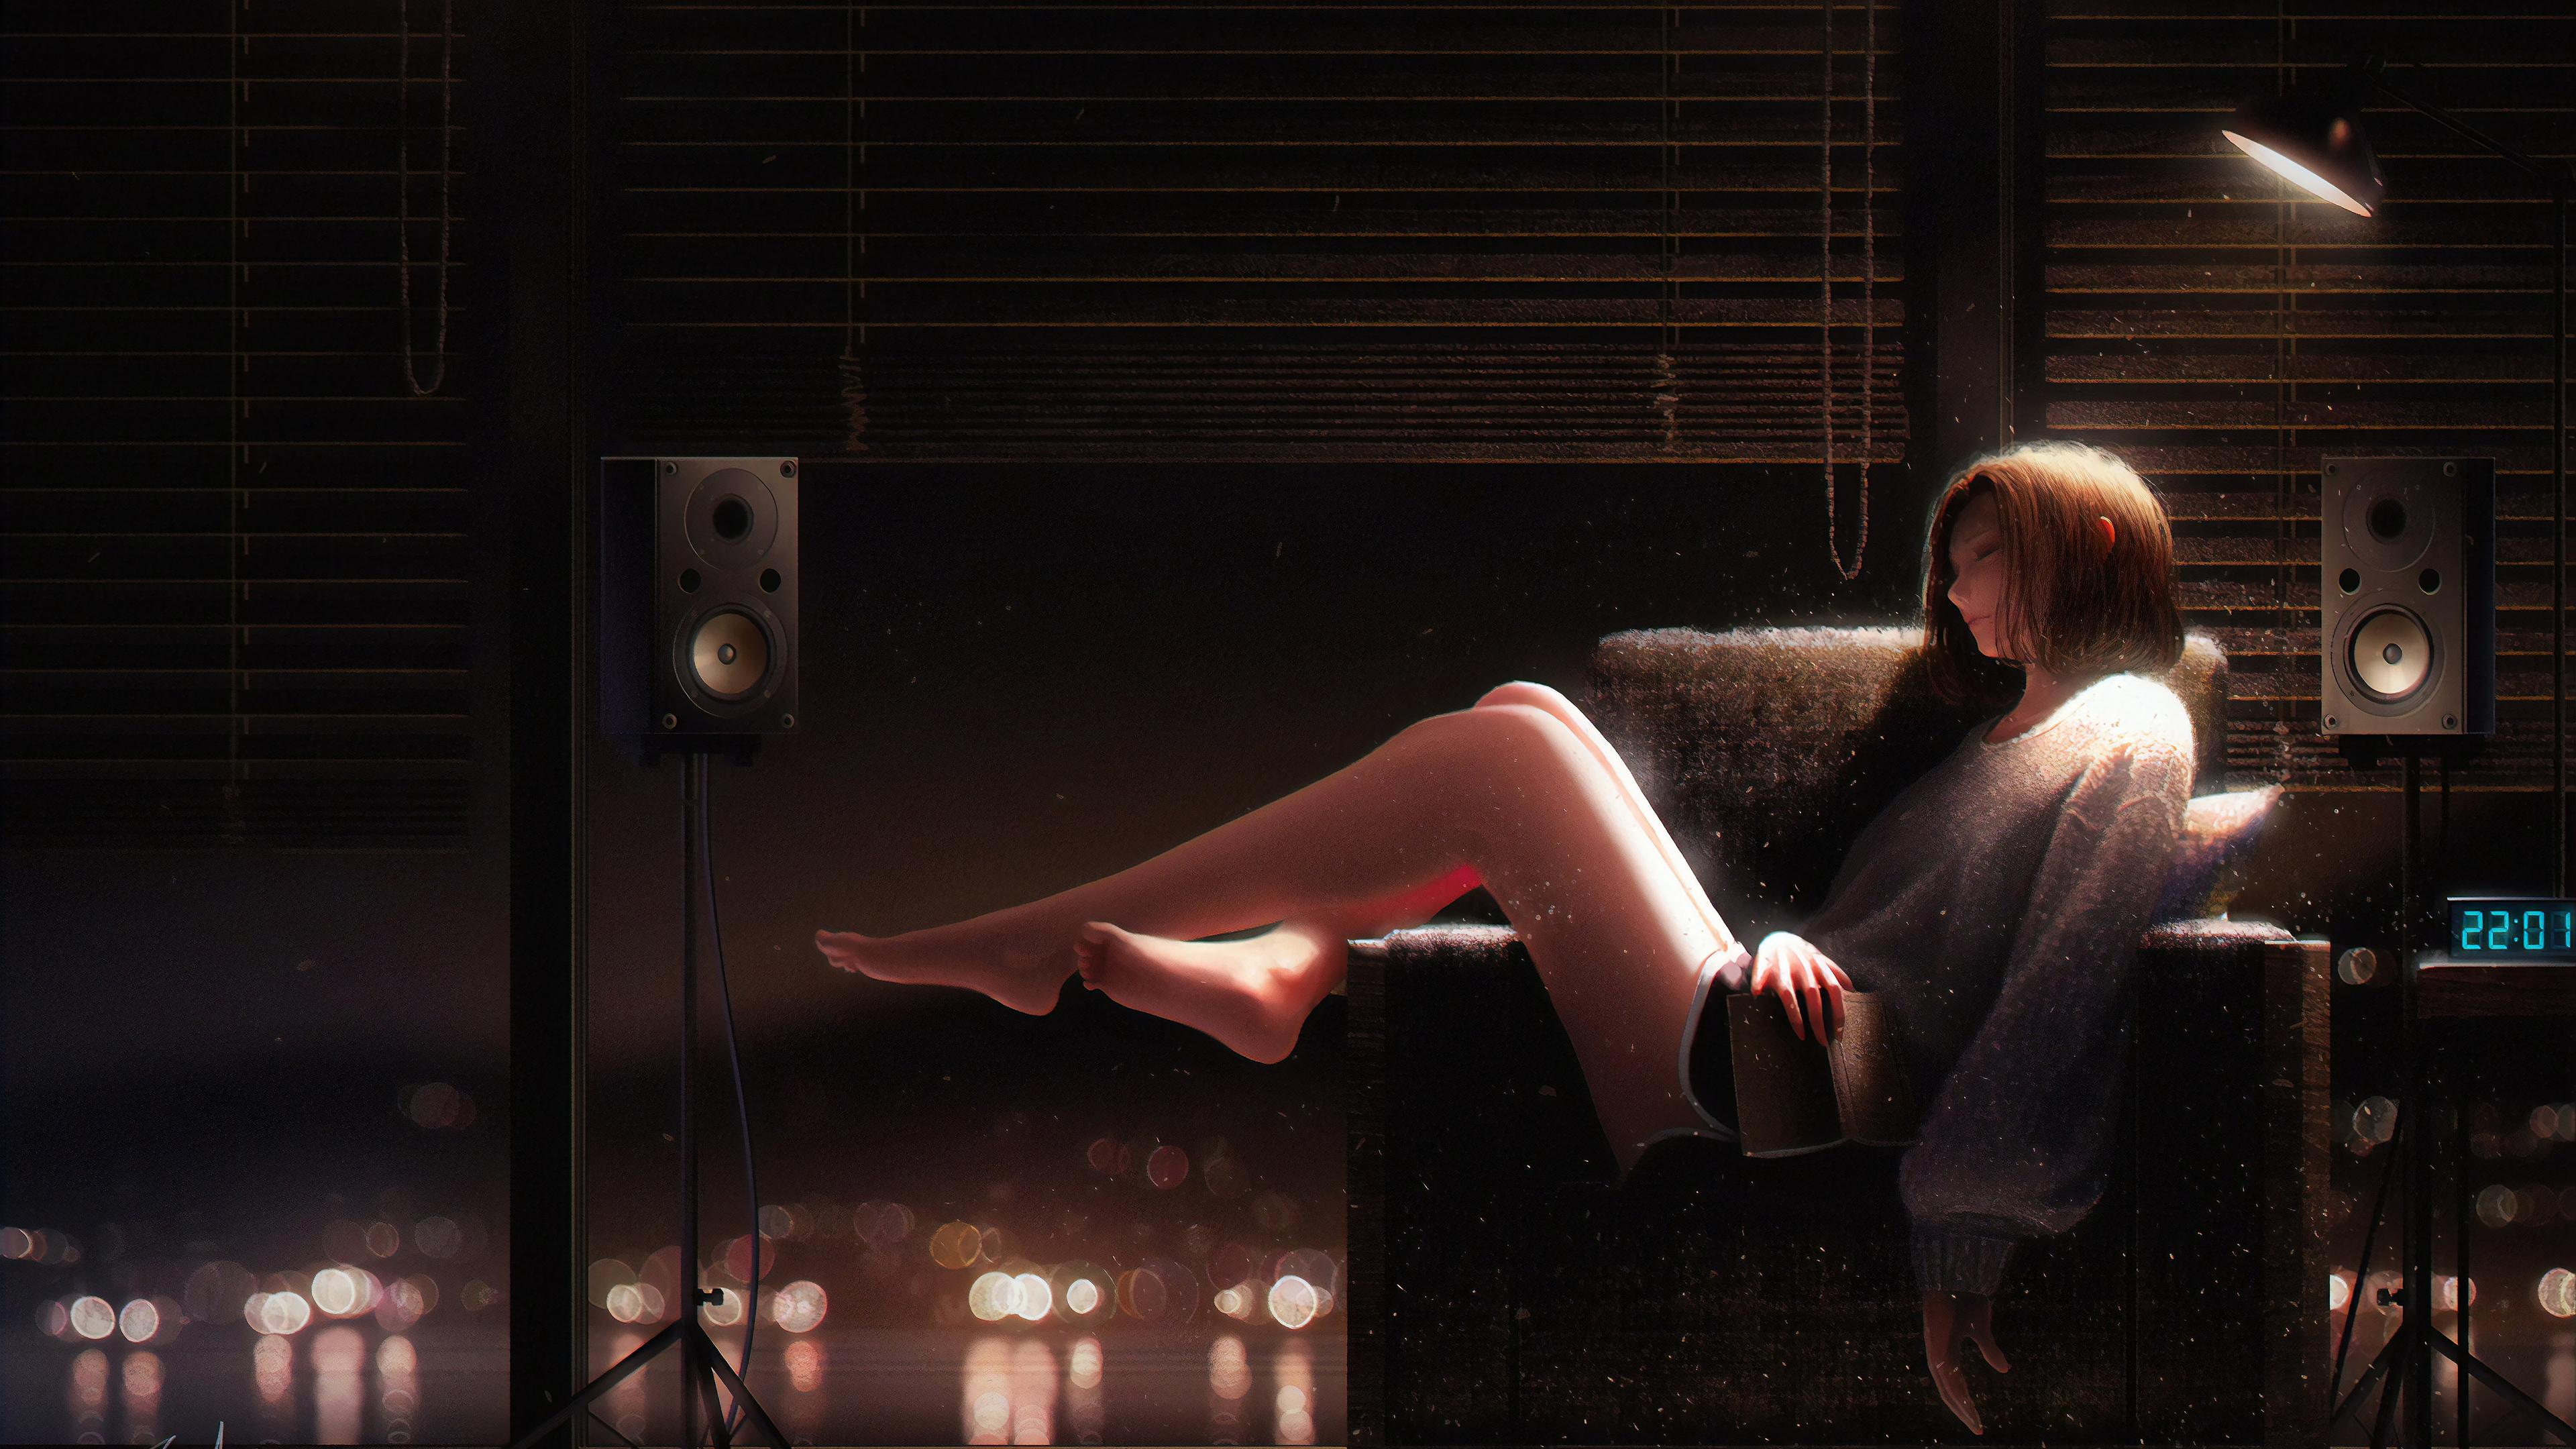 lost in your thoughts 1563222538 - Lost In Your Thoughts - sad wallpapers, hd-wallpapers, artwork wallpapers, artist wallpapers, anime wallpapers, anime girl wallpapers, alone wallpapers, 4k-wallpapers